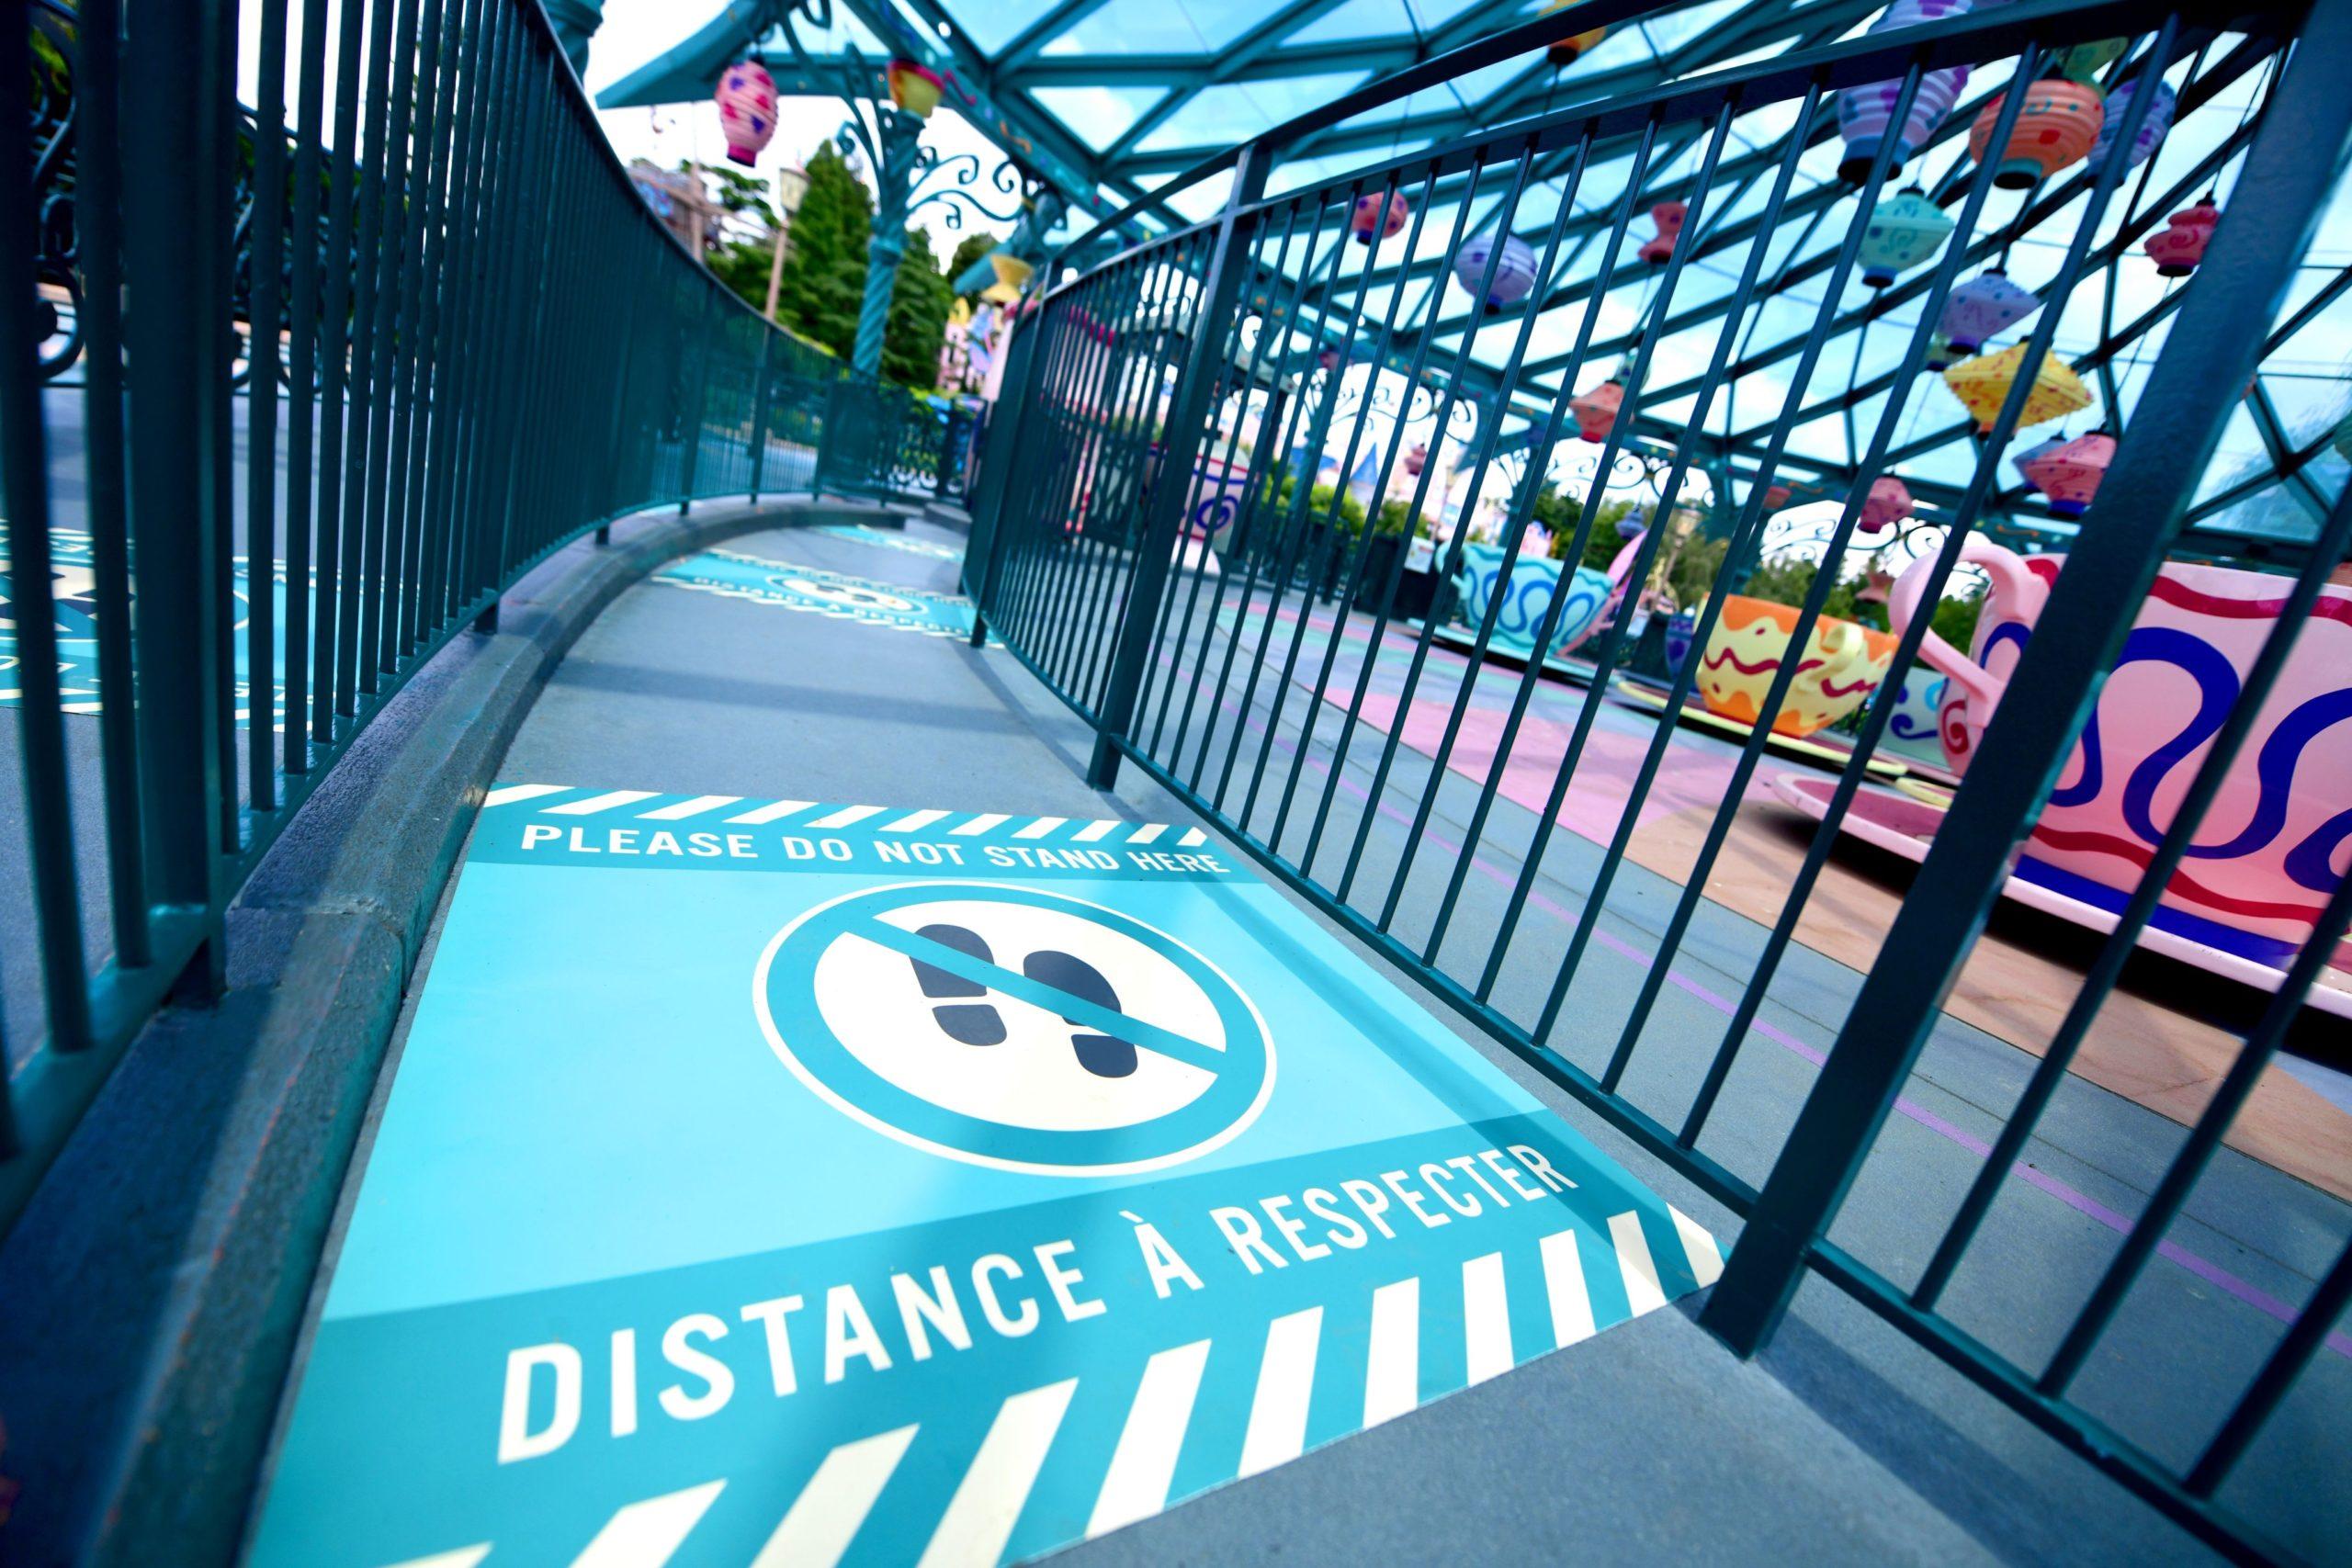 Marquage au sol - Disneyland Paris - Distanciation